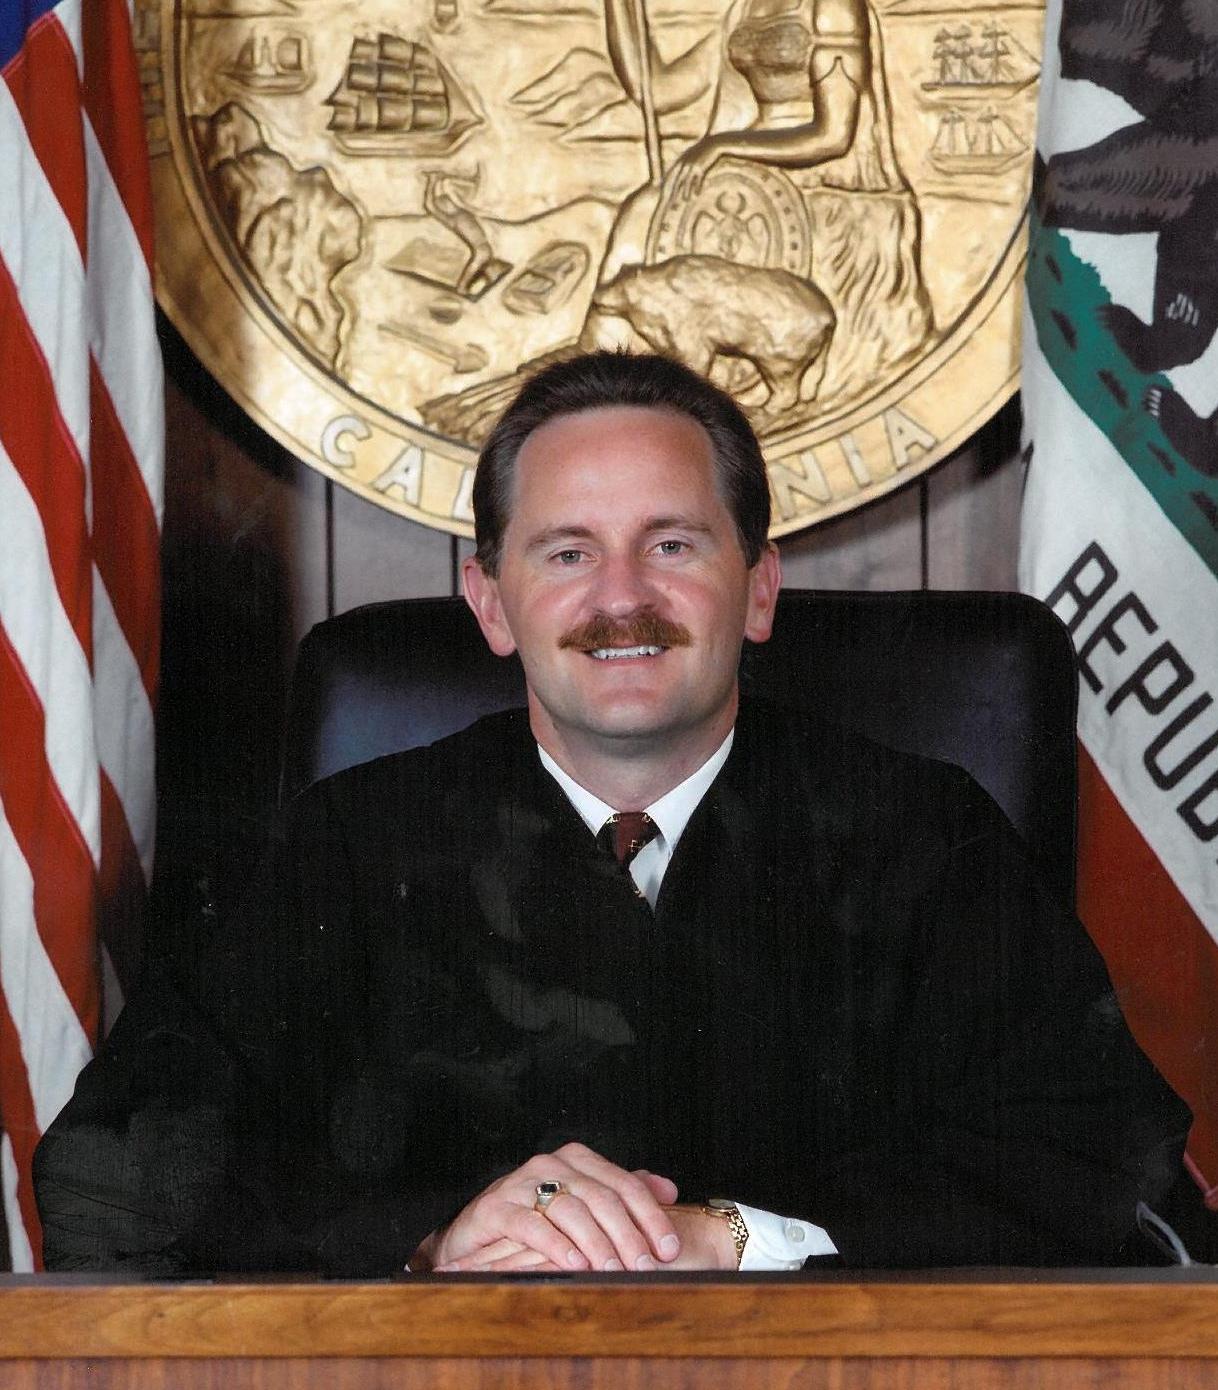 2016 - Judge John P. Vander FeerSuperior Court of San BernardinoMay 19, 2016